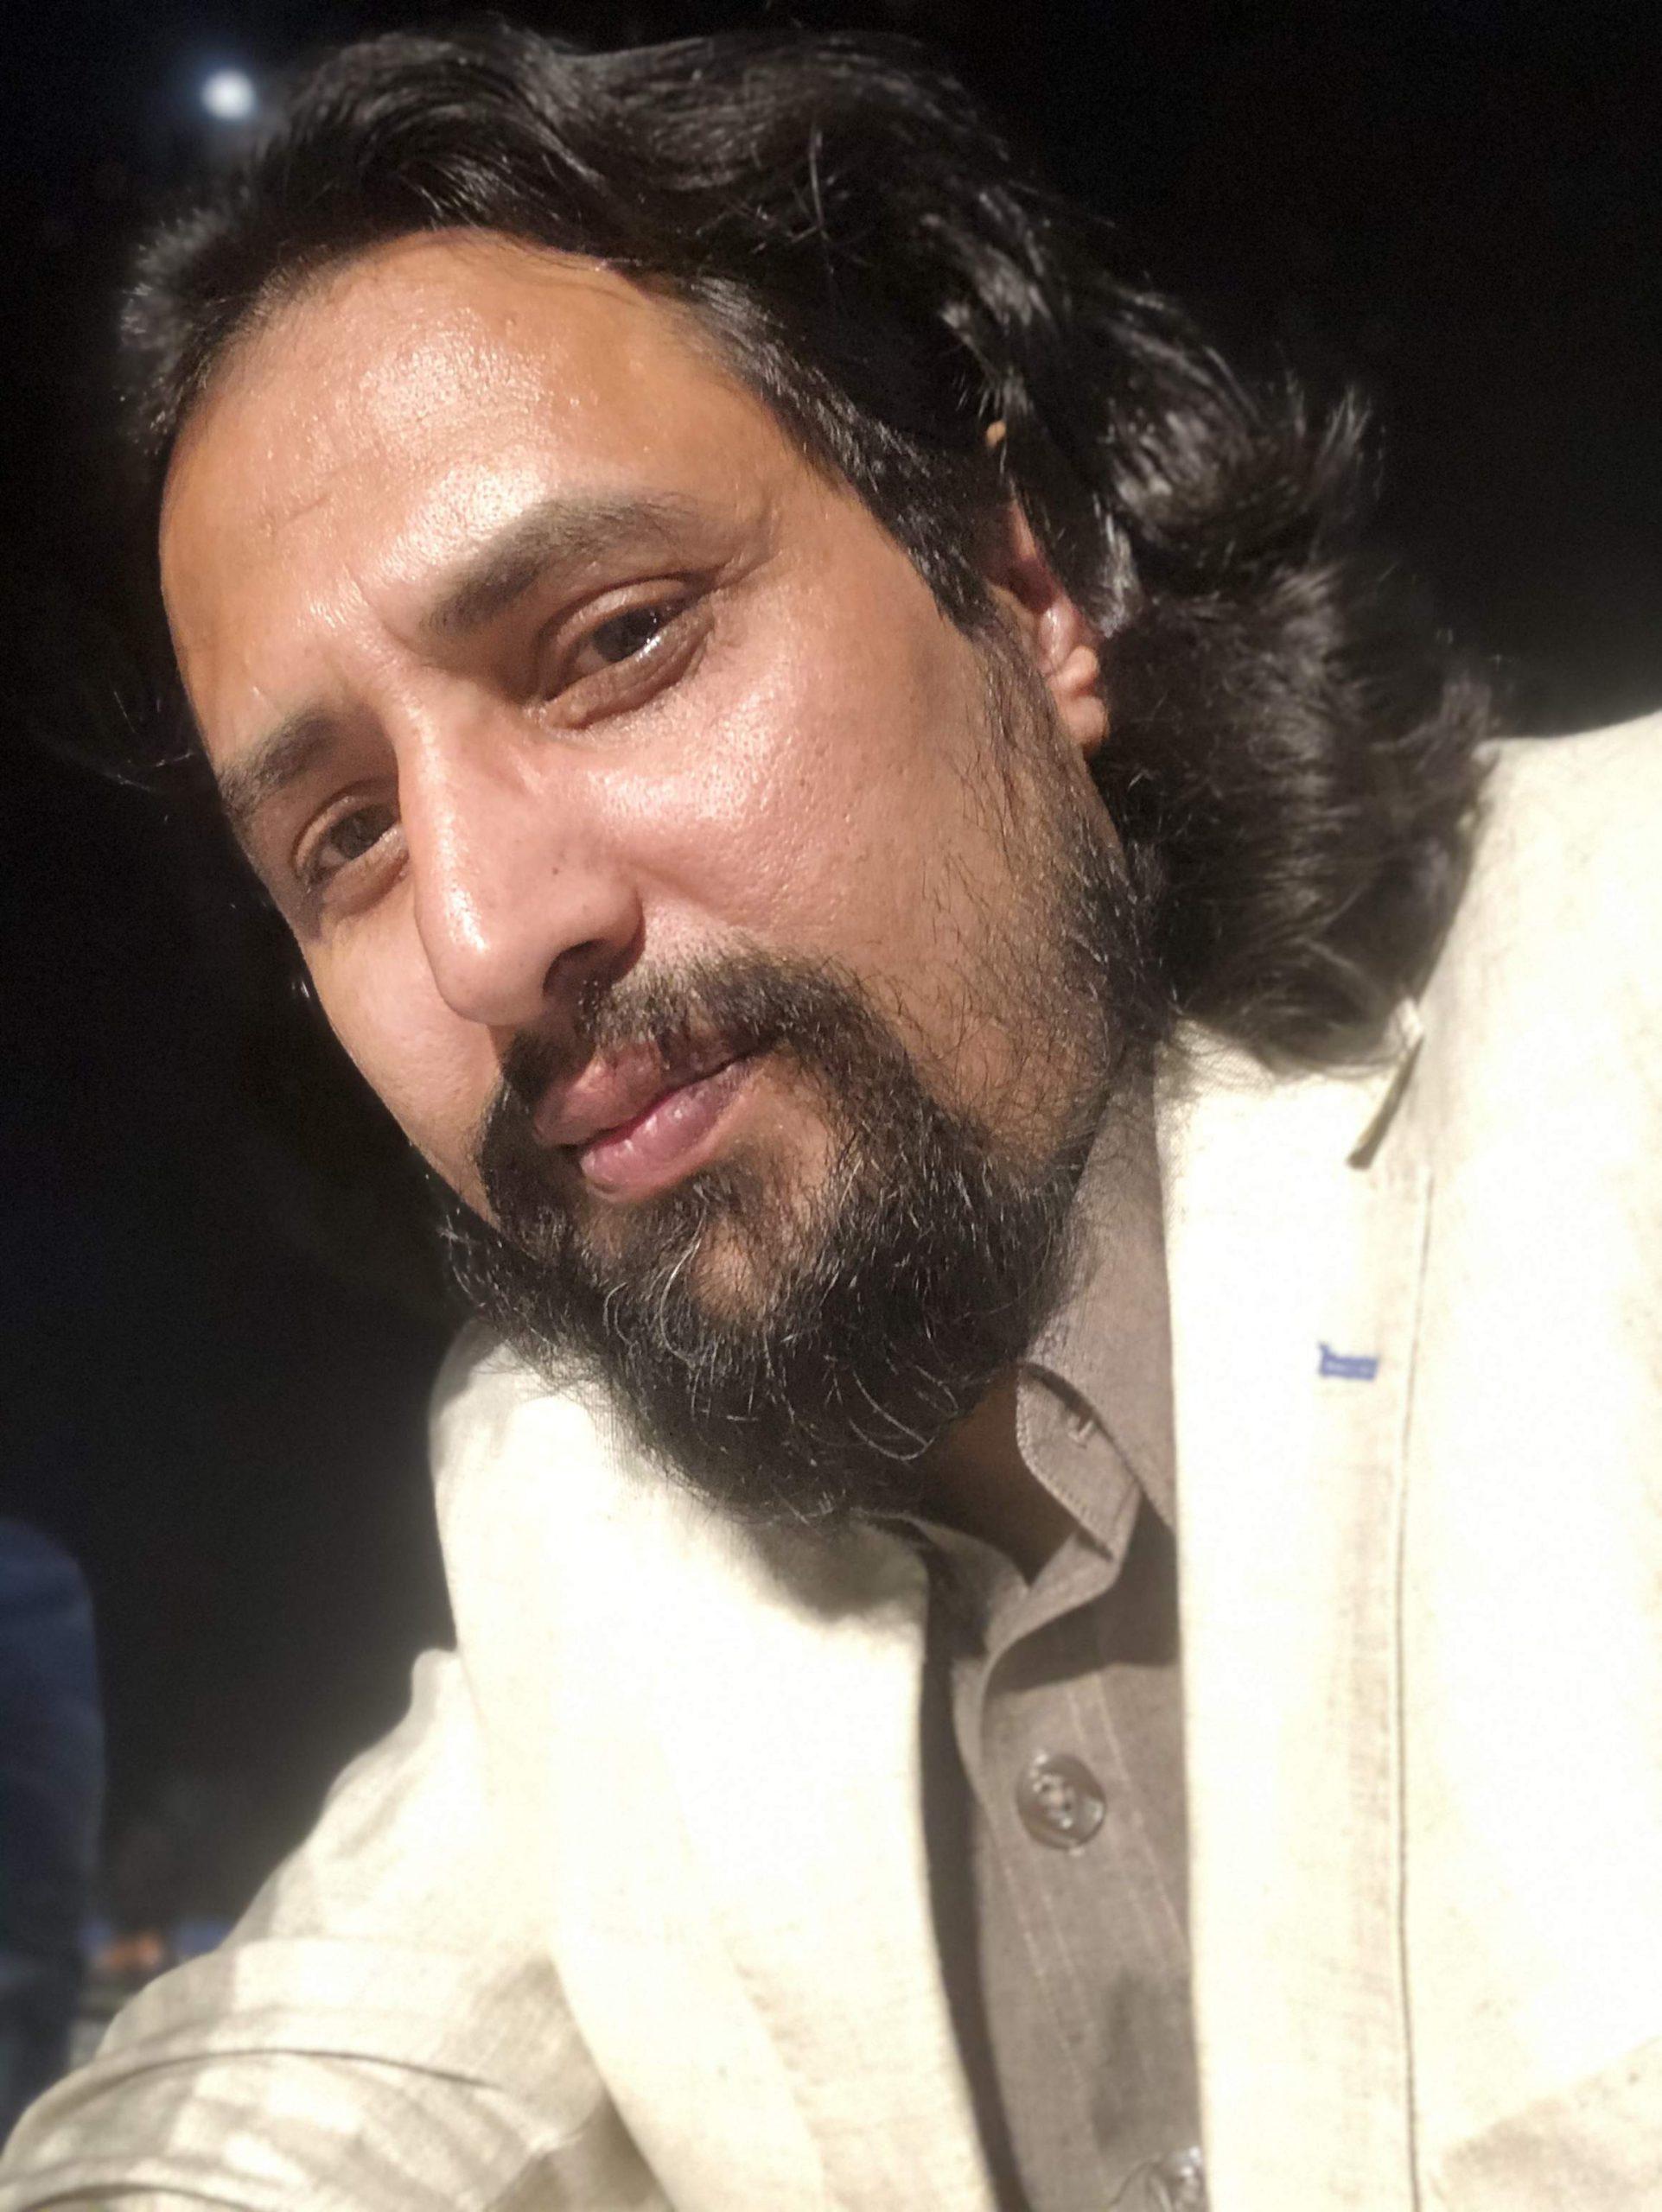 sabir iqbal